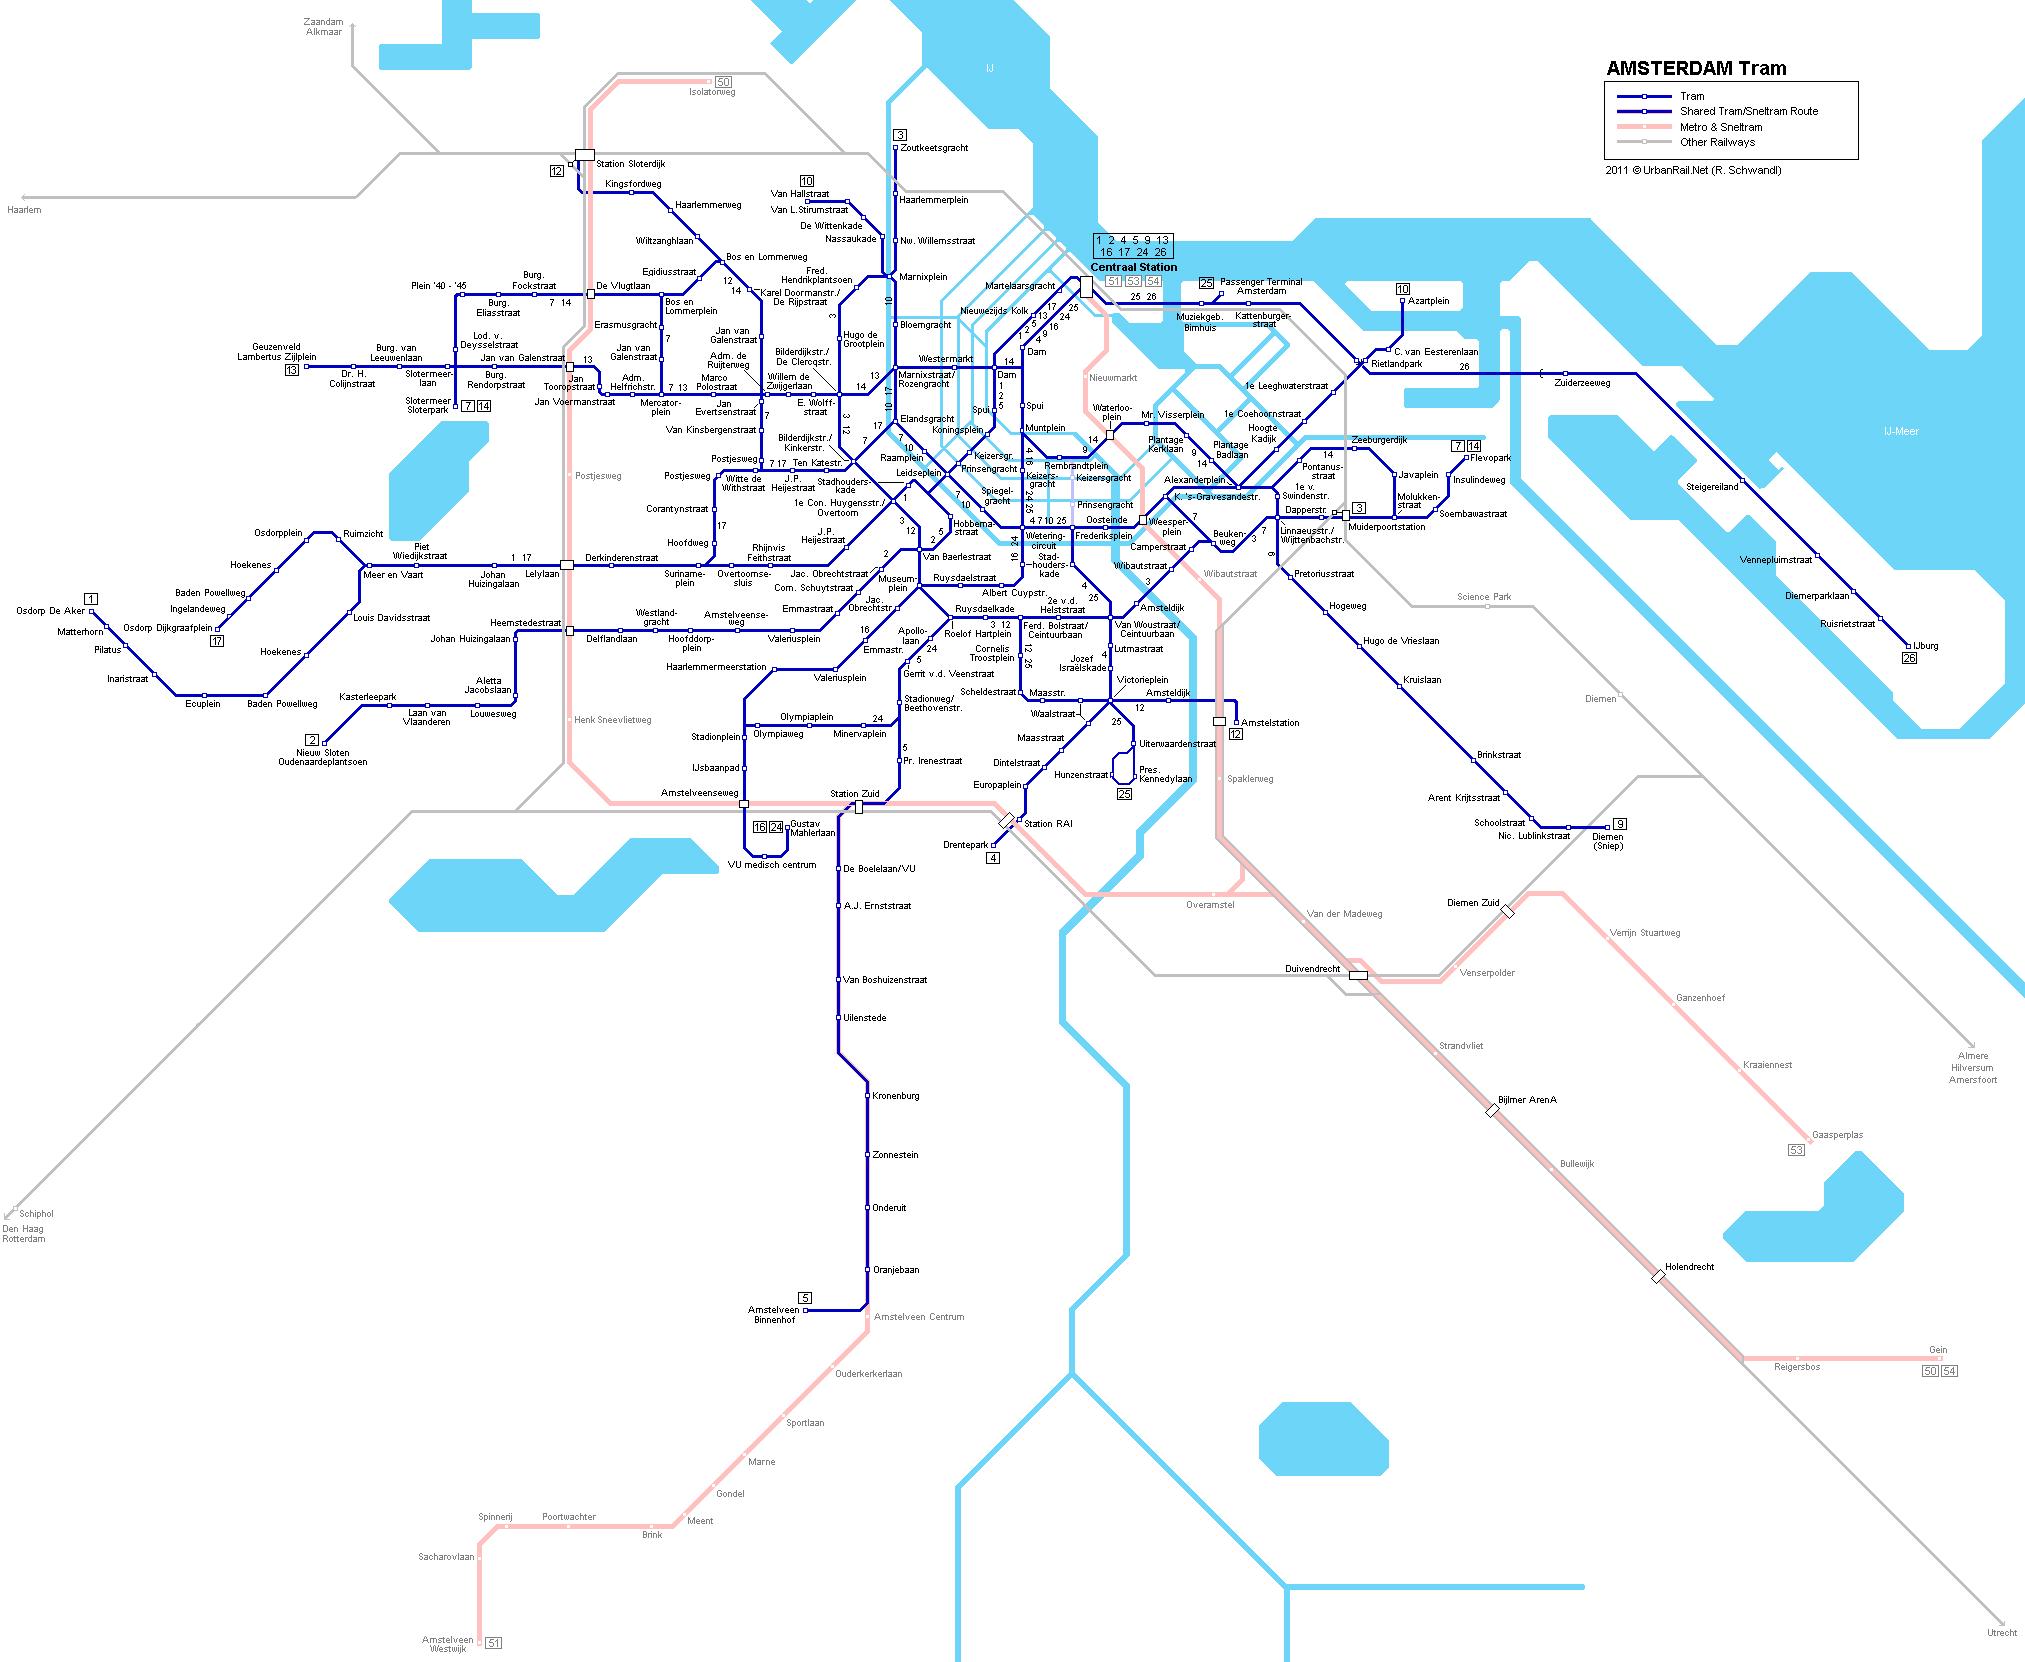 Tram Map Amsterdam Amsterdam Tram Map for Free Download | Map of Amsterdam Tramway  Tram Map Amsterdam